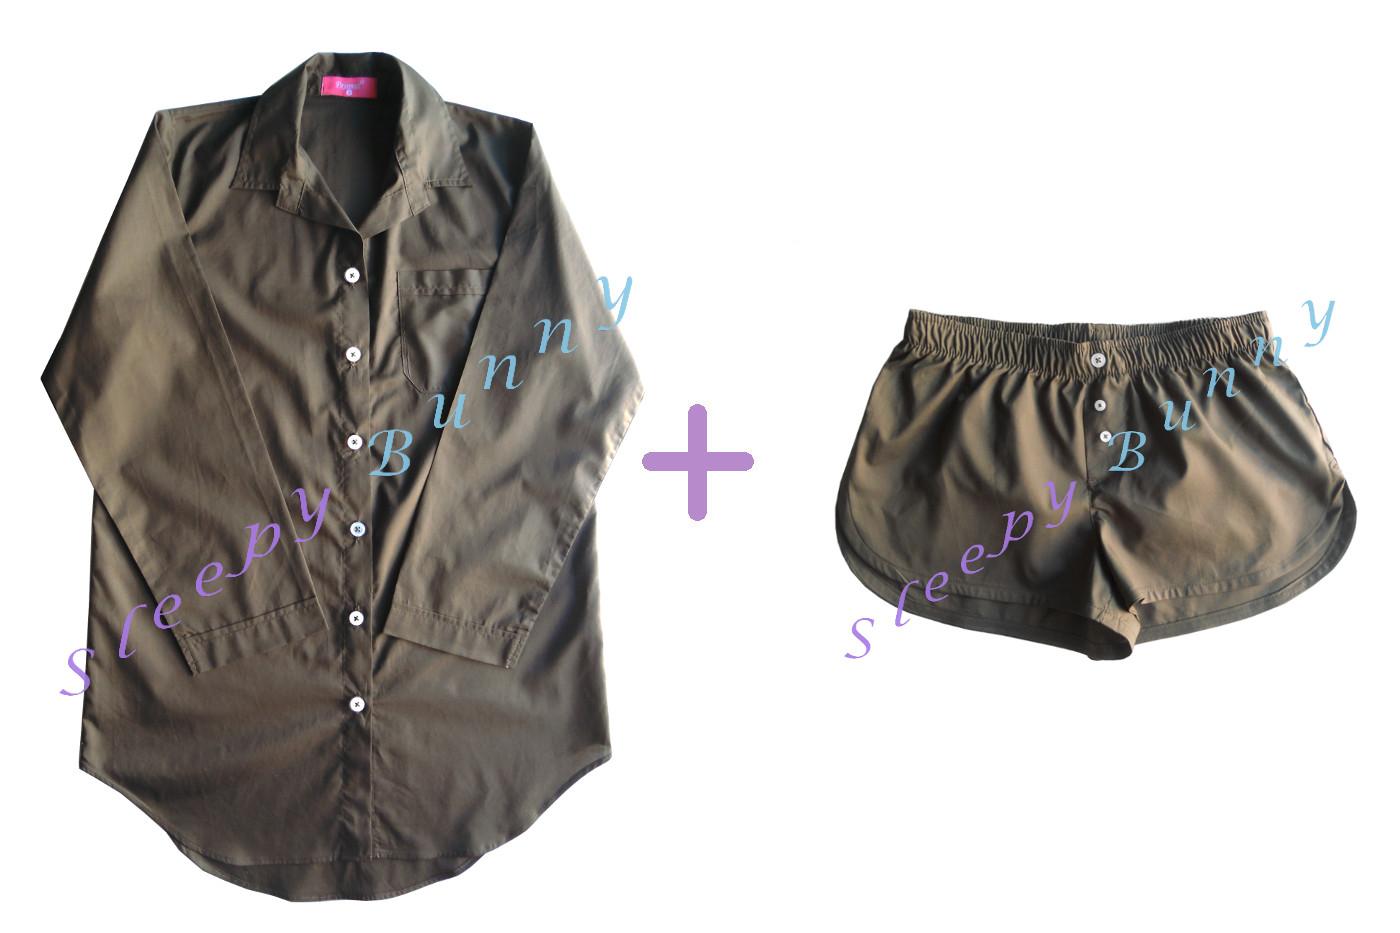 Promotion db16 set สีน้ำตาลเขียวขี้ม้า ชุดนอนเดรสเชิ้ต (Size S,M) + boxer (Size S)